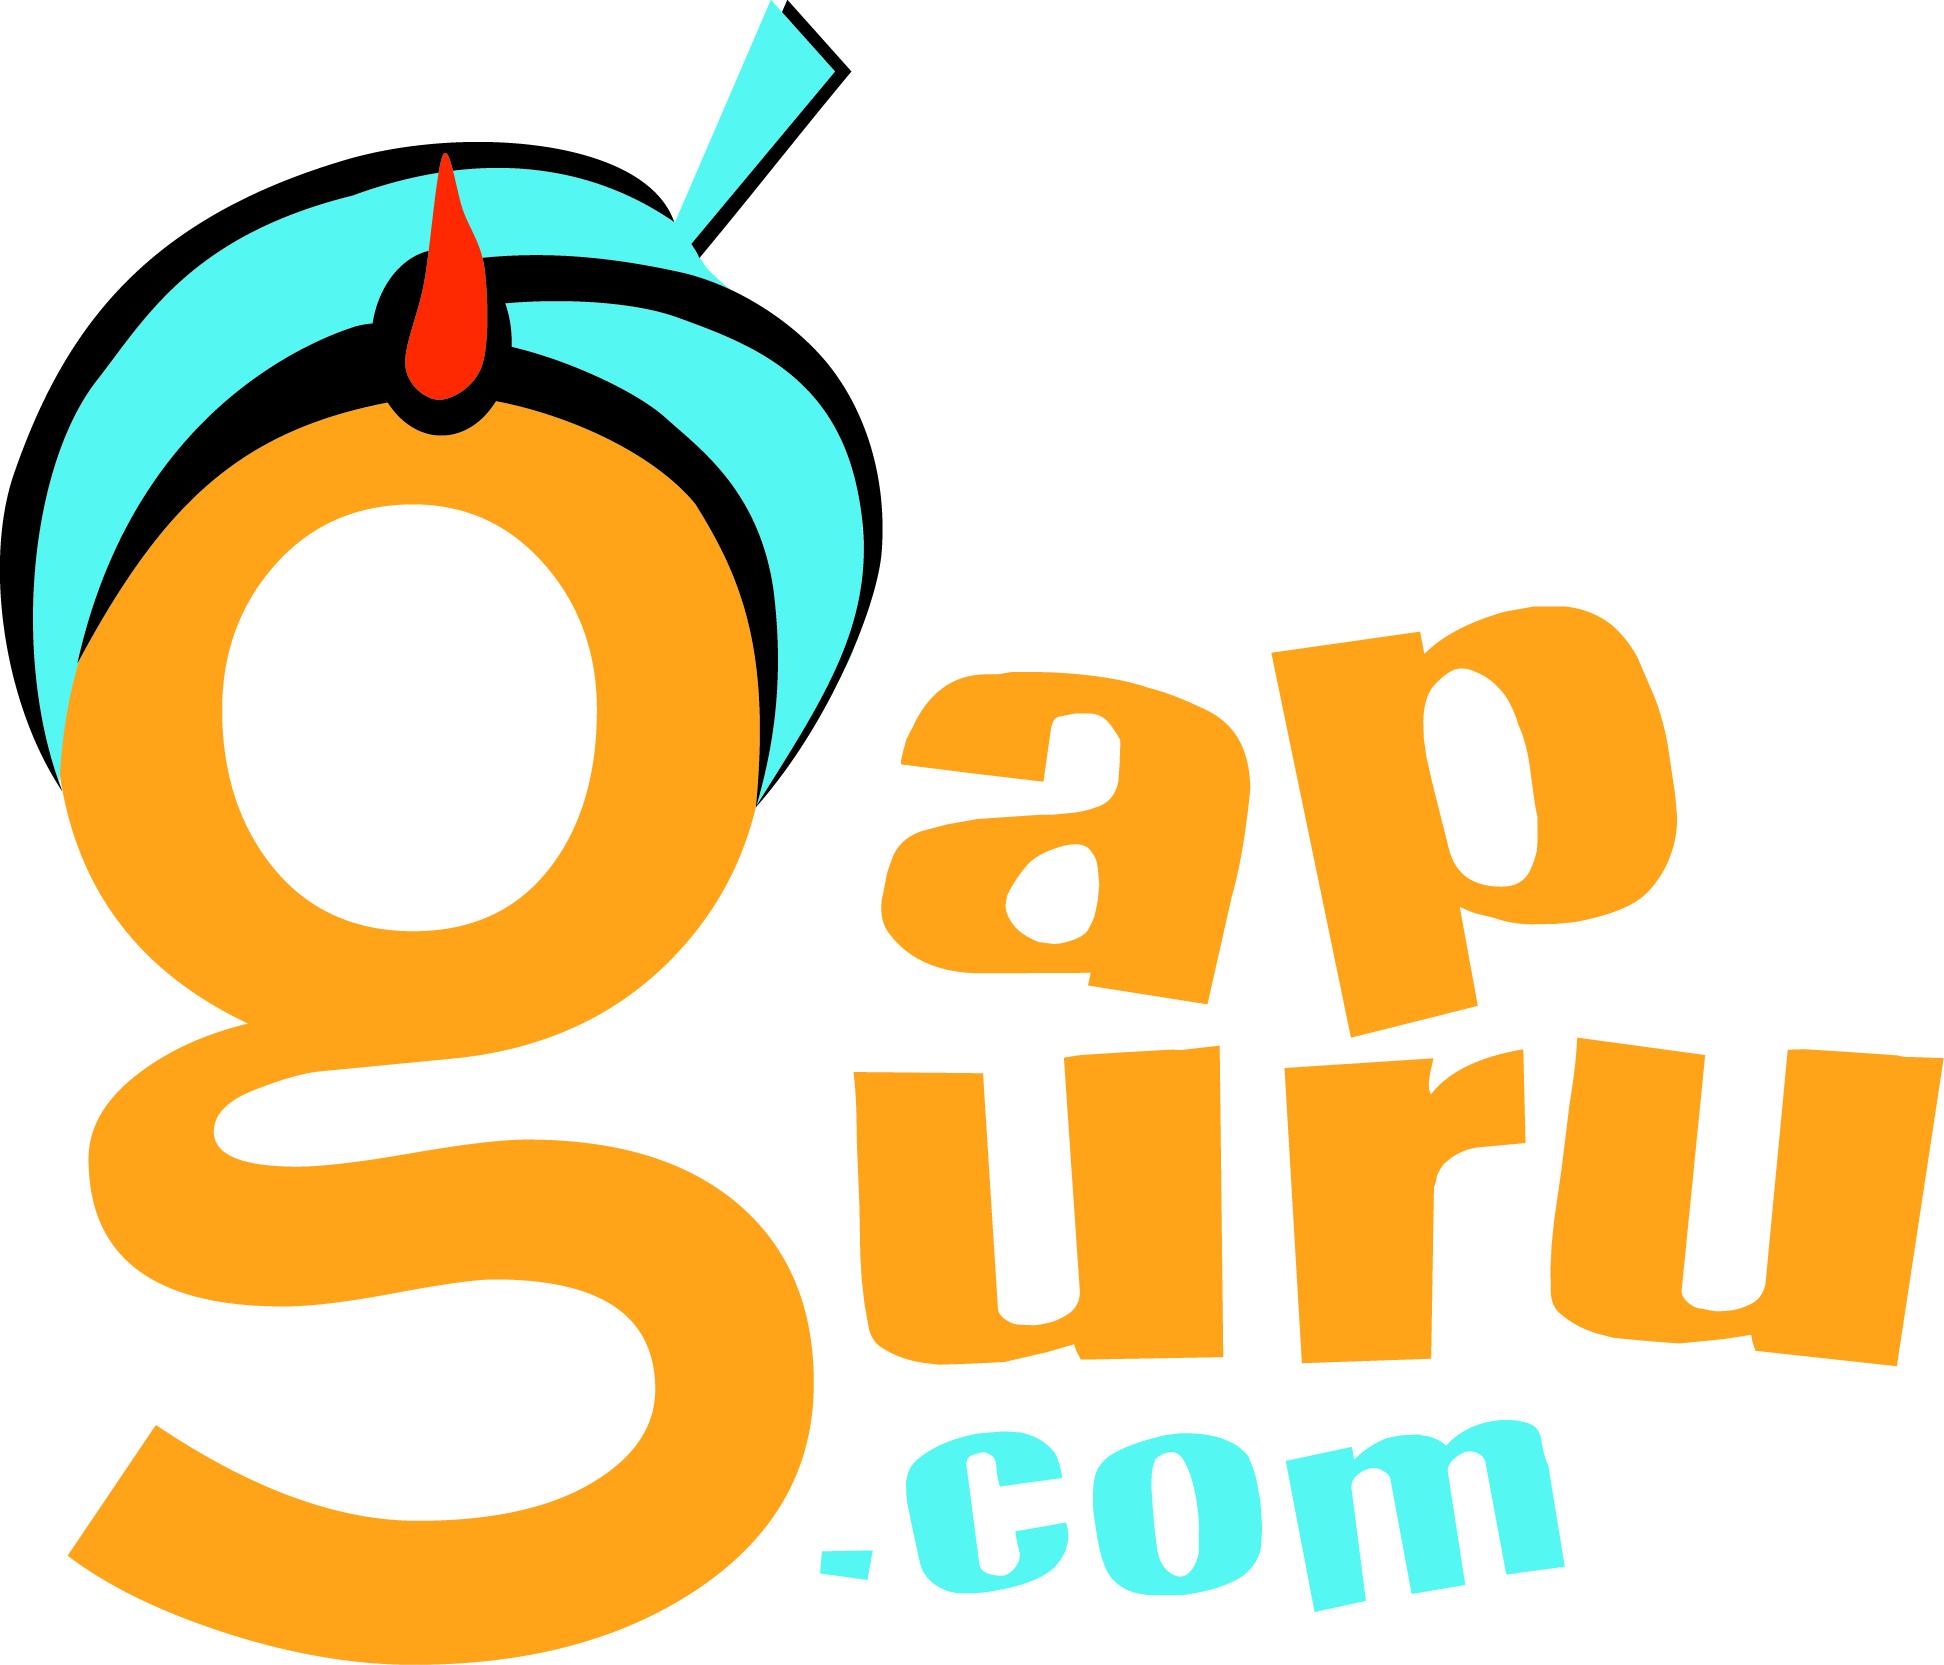 GapGuru www.gapguru.com